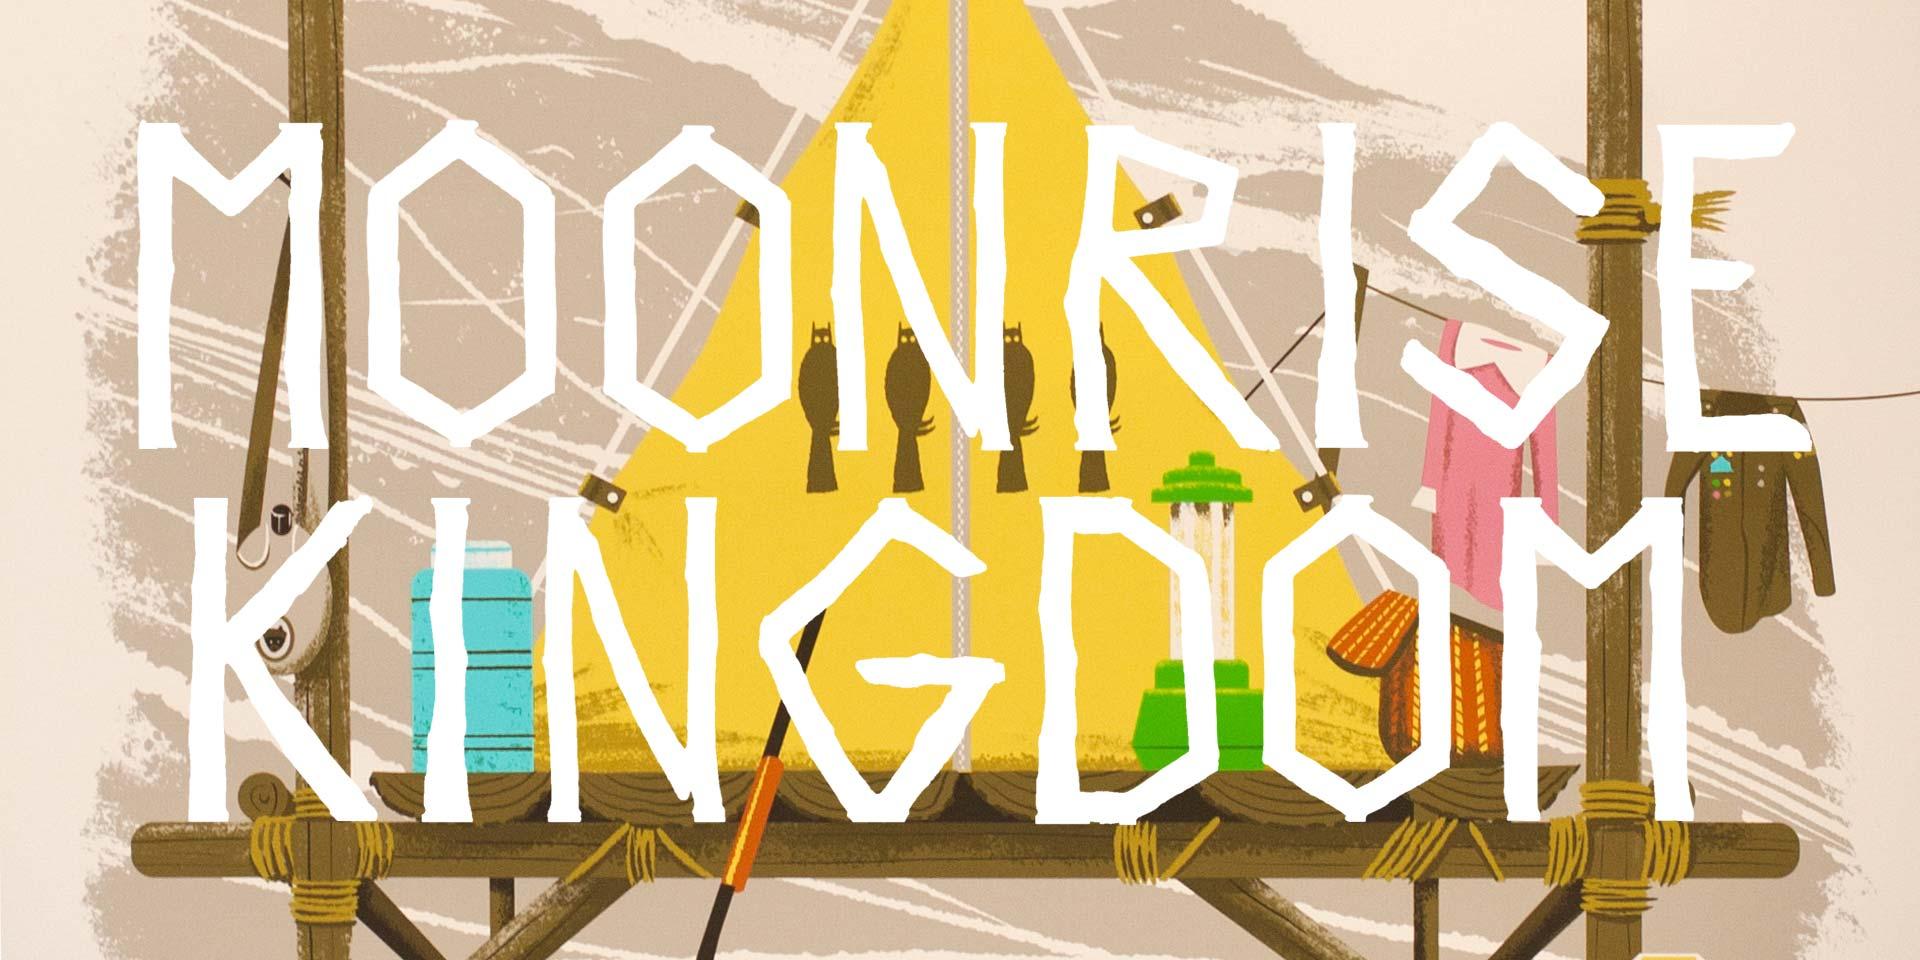 Moonrise-Kingdom-slide.jpg